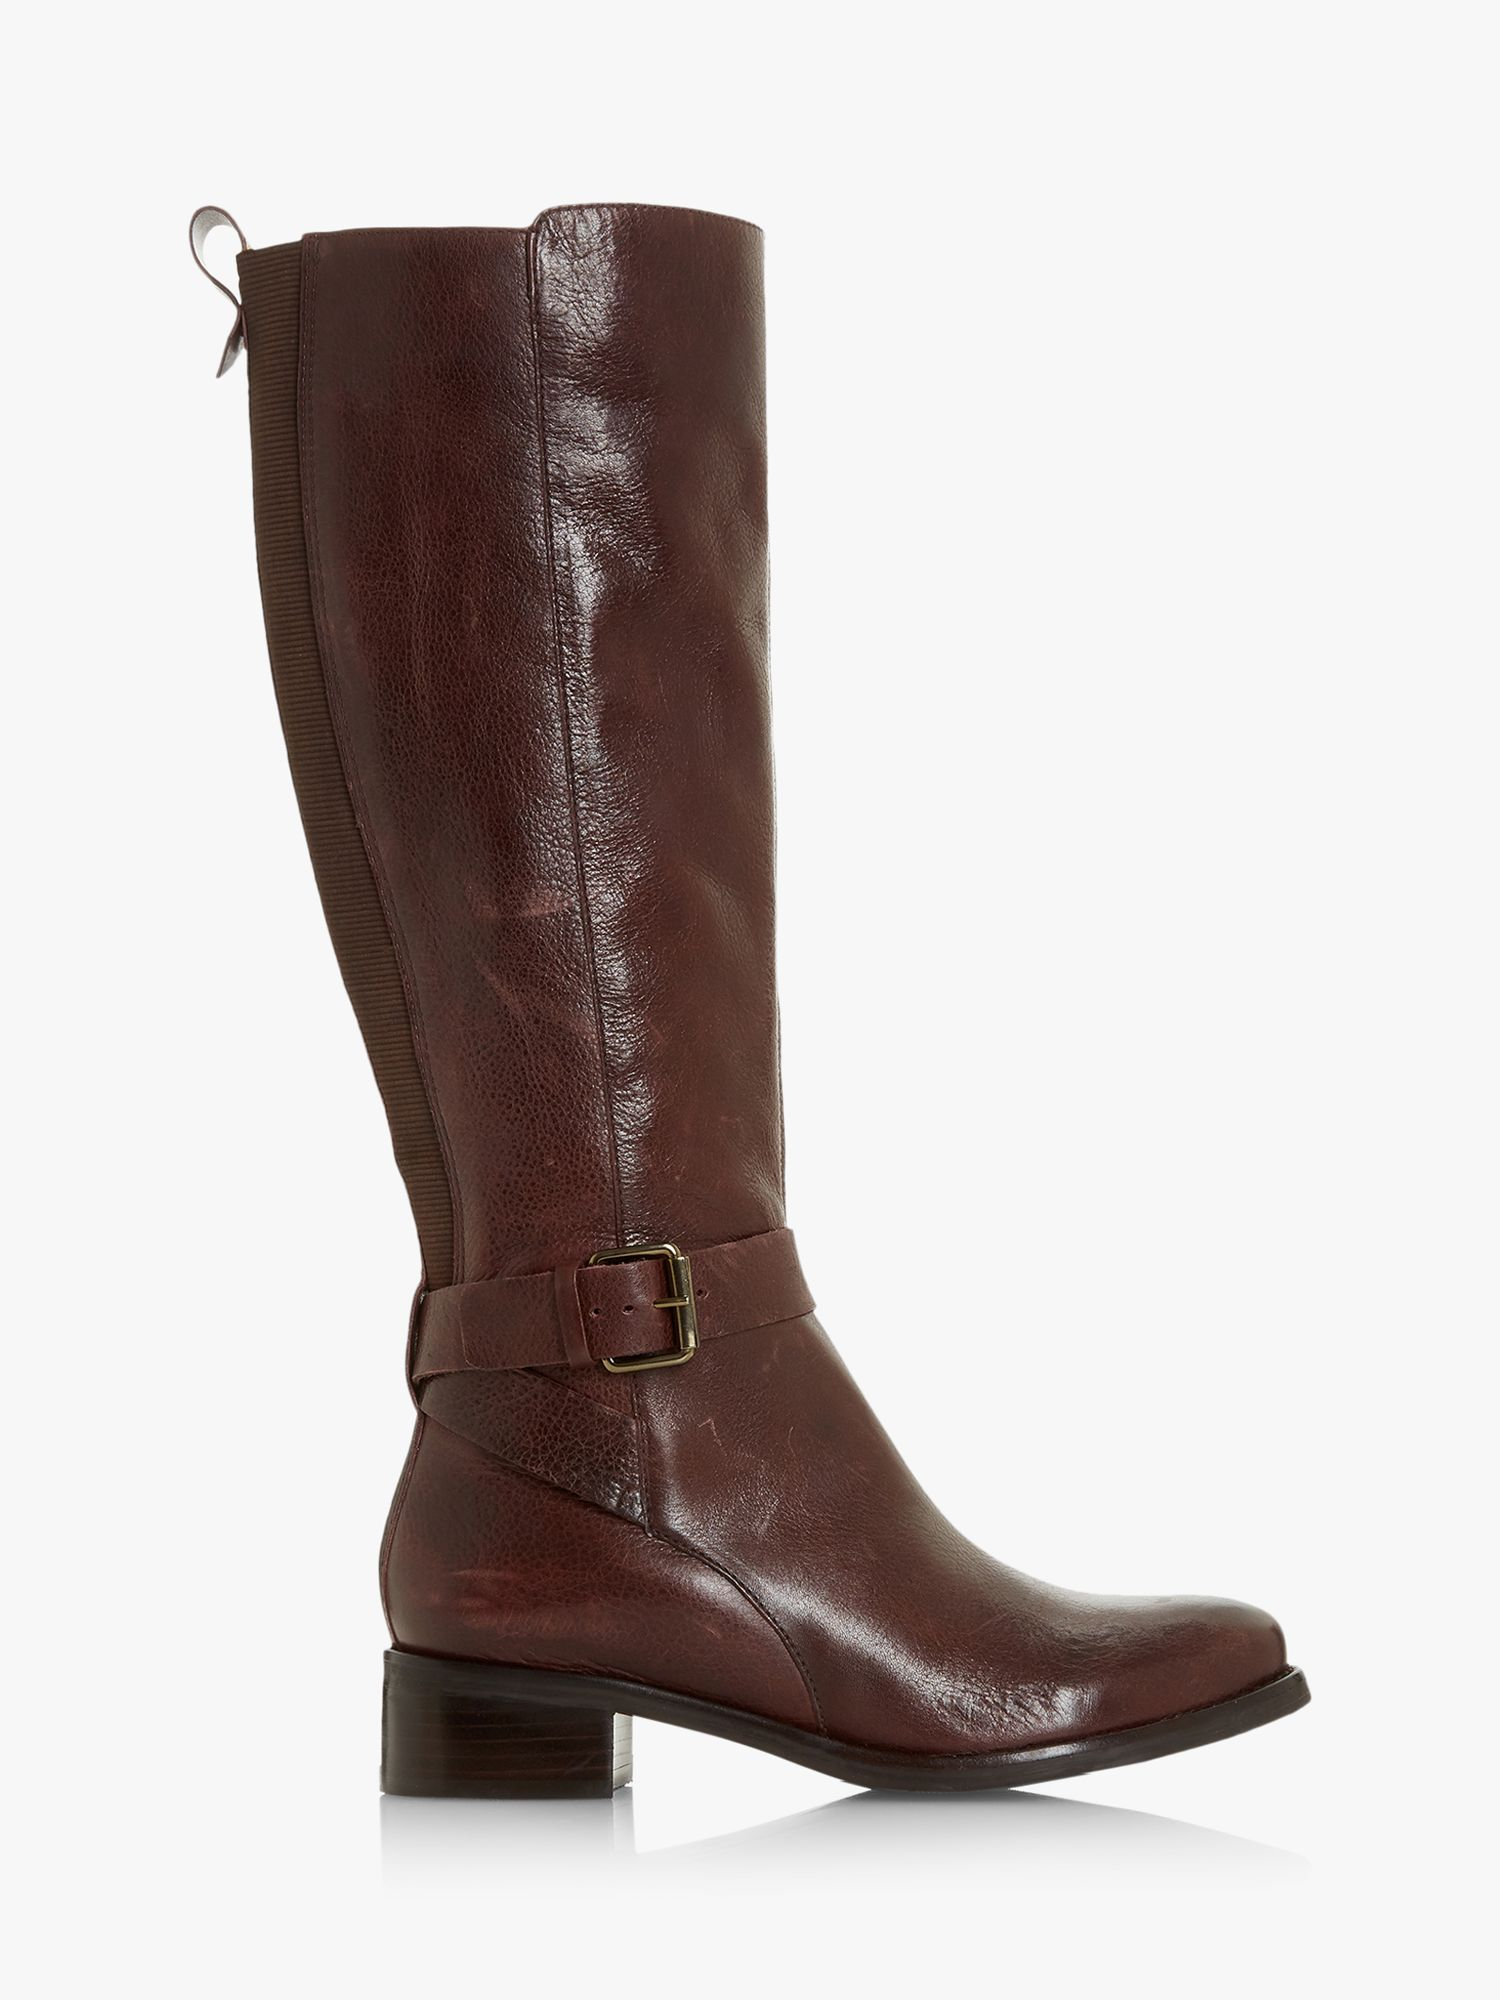 Bertie Bertie Taykonie Knee High Boots, Burgundy